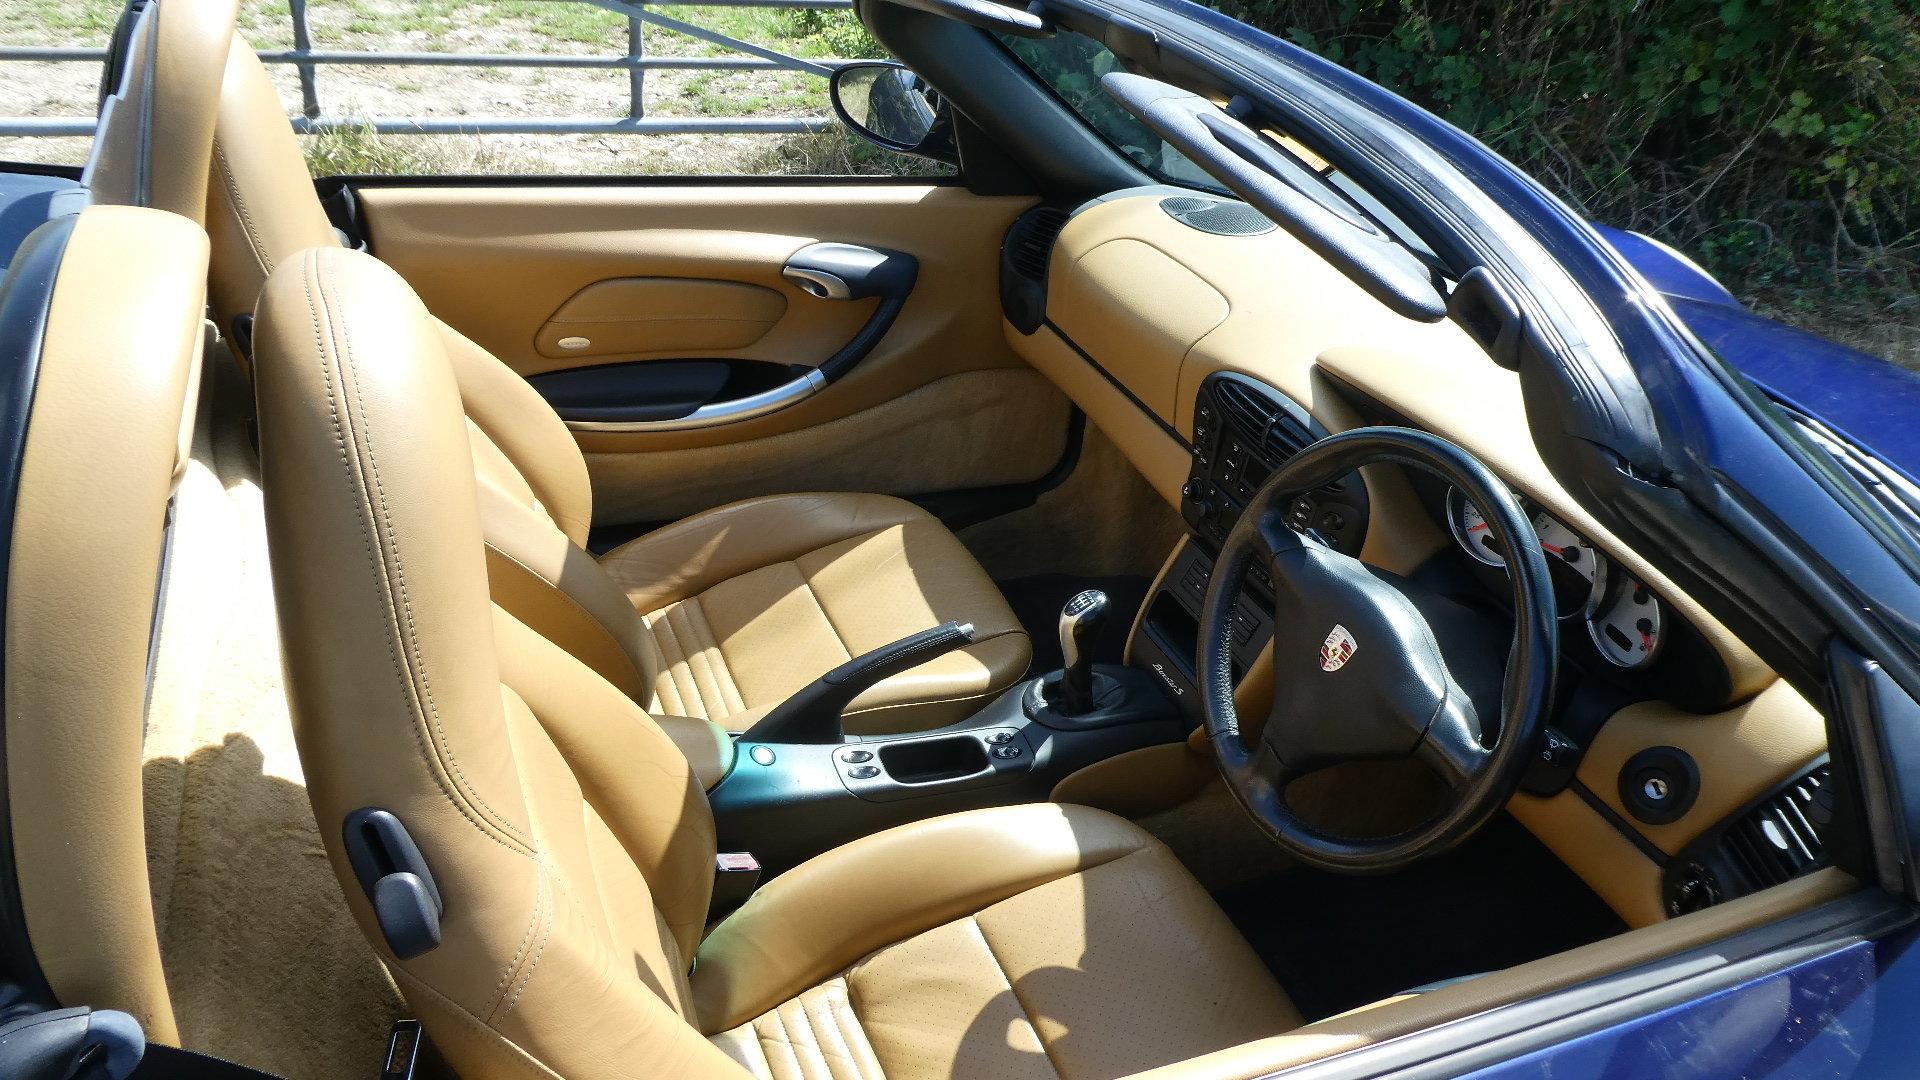 2001 Porsche Boxster S  3.2 litre Convertible  SOLD (picture 5 of 6)